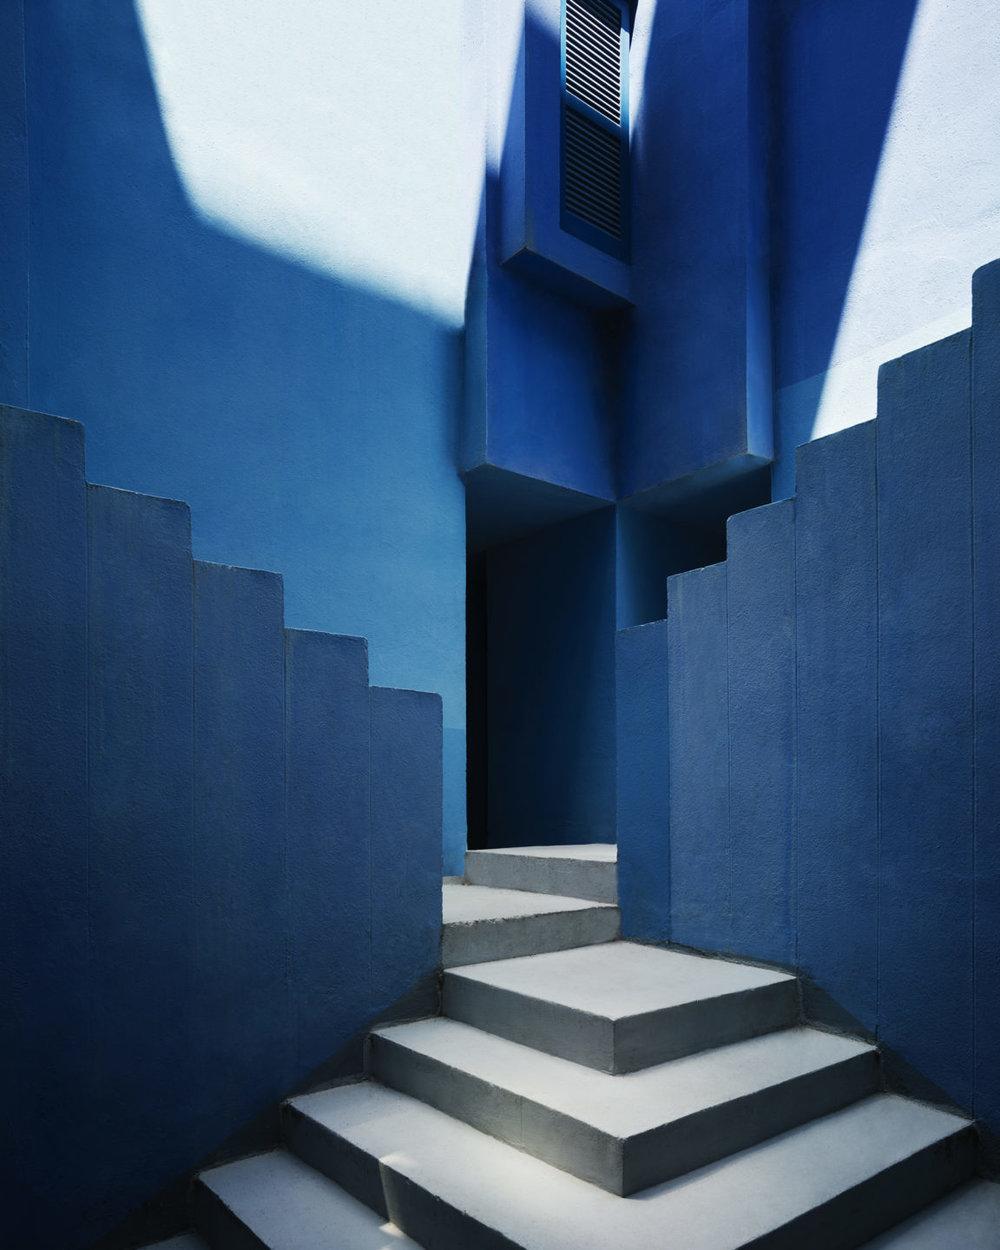 Muralla_Roja_Calpe_Spain_Ricardo_Bofill_Taller_Arquitectura_028-1152x1440.jpg